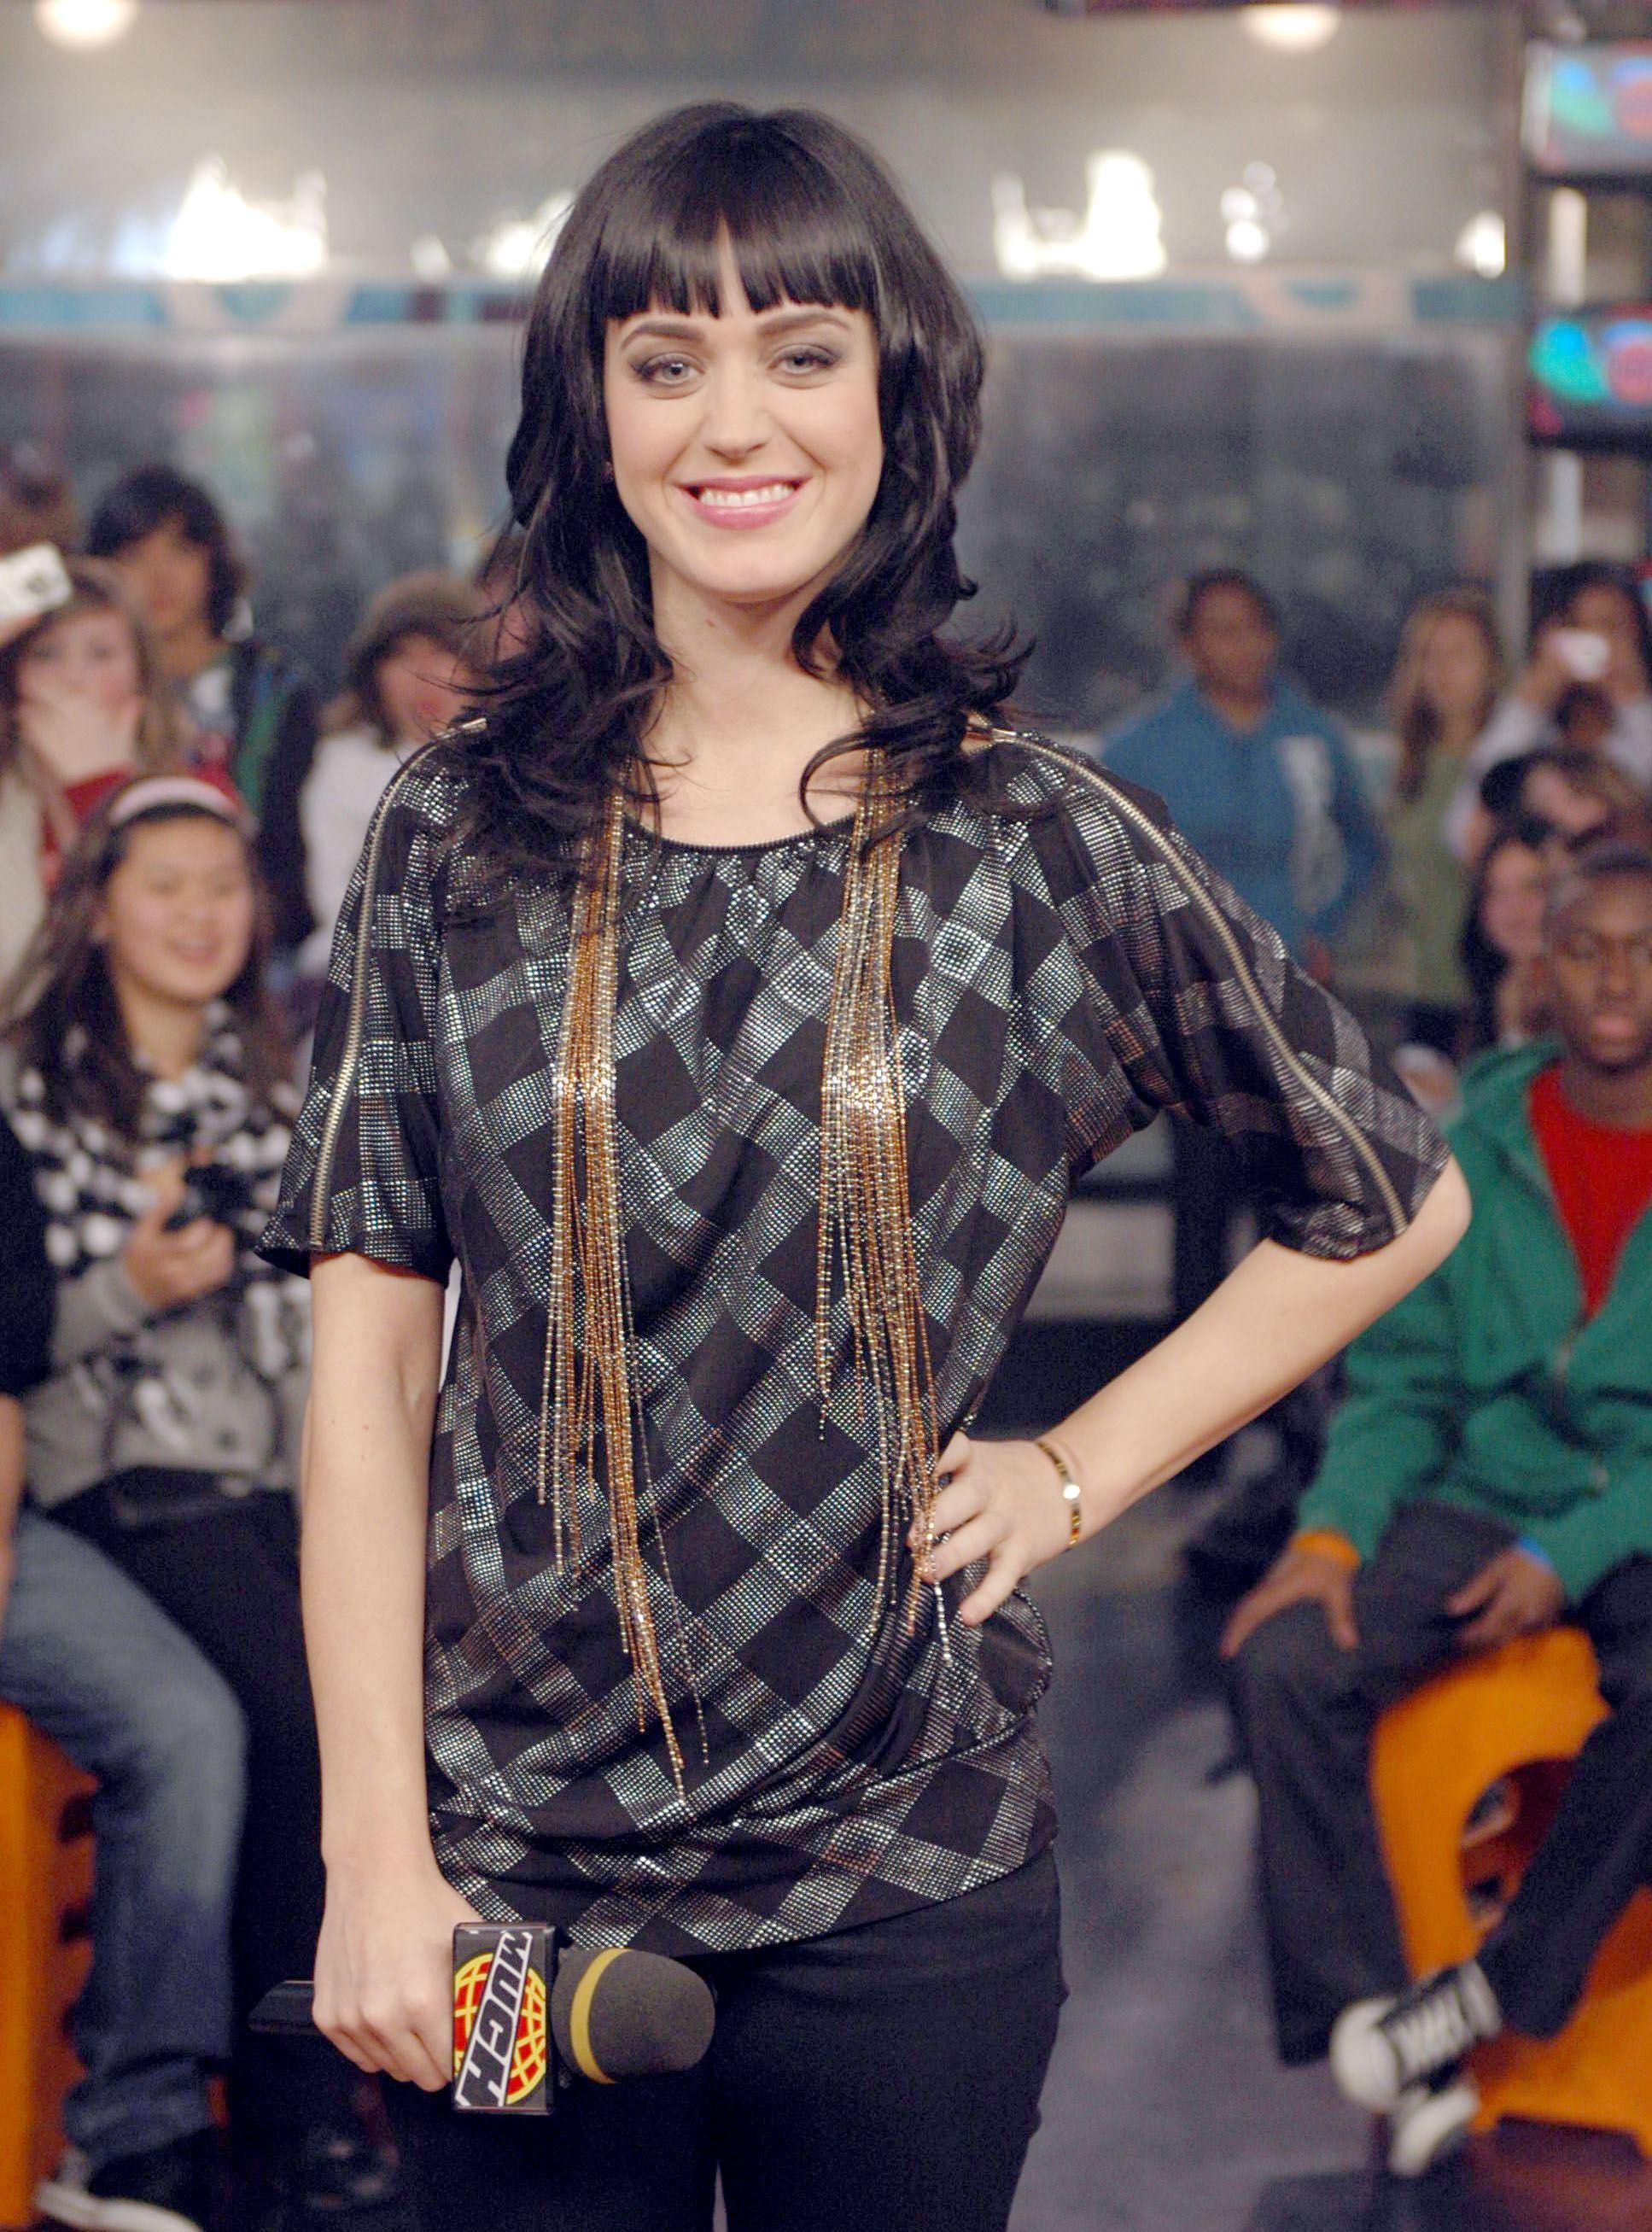 水果姐katy perry_出席 MuchOnDemand 节目 MuchMusic HQ - 活动 - Katy Perry China 凯蒂佩芮中国 ...